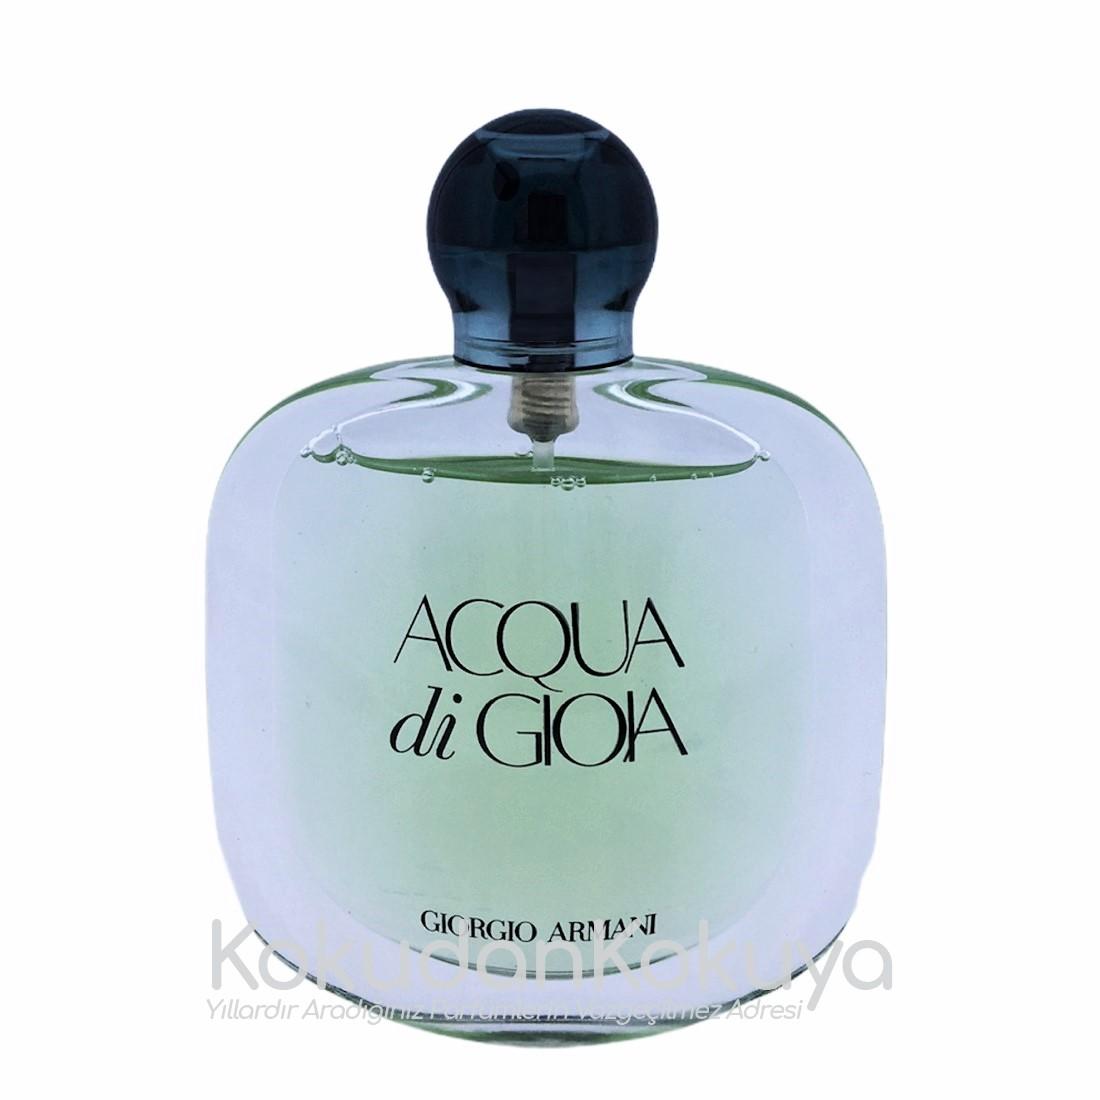 GIORGIO ARMANI Acqua di Gioia Parfüm Kadın 50ml Eau De Parfum (EDP) Sprey